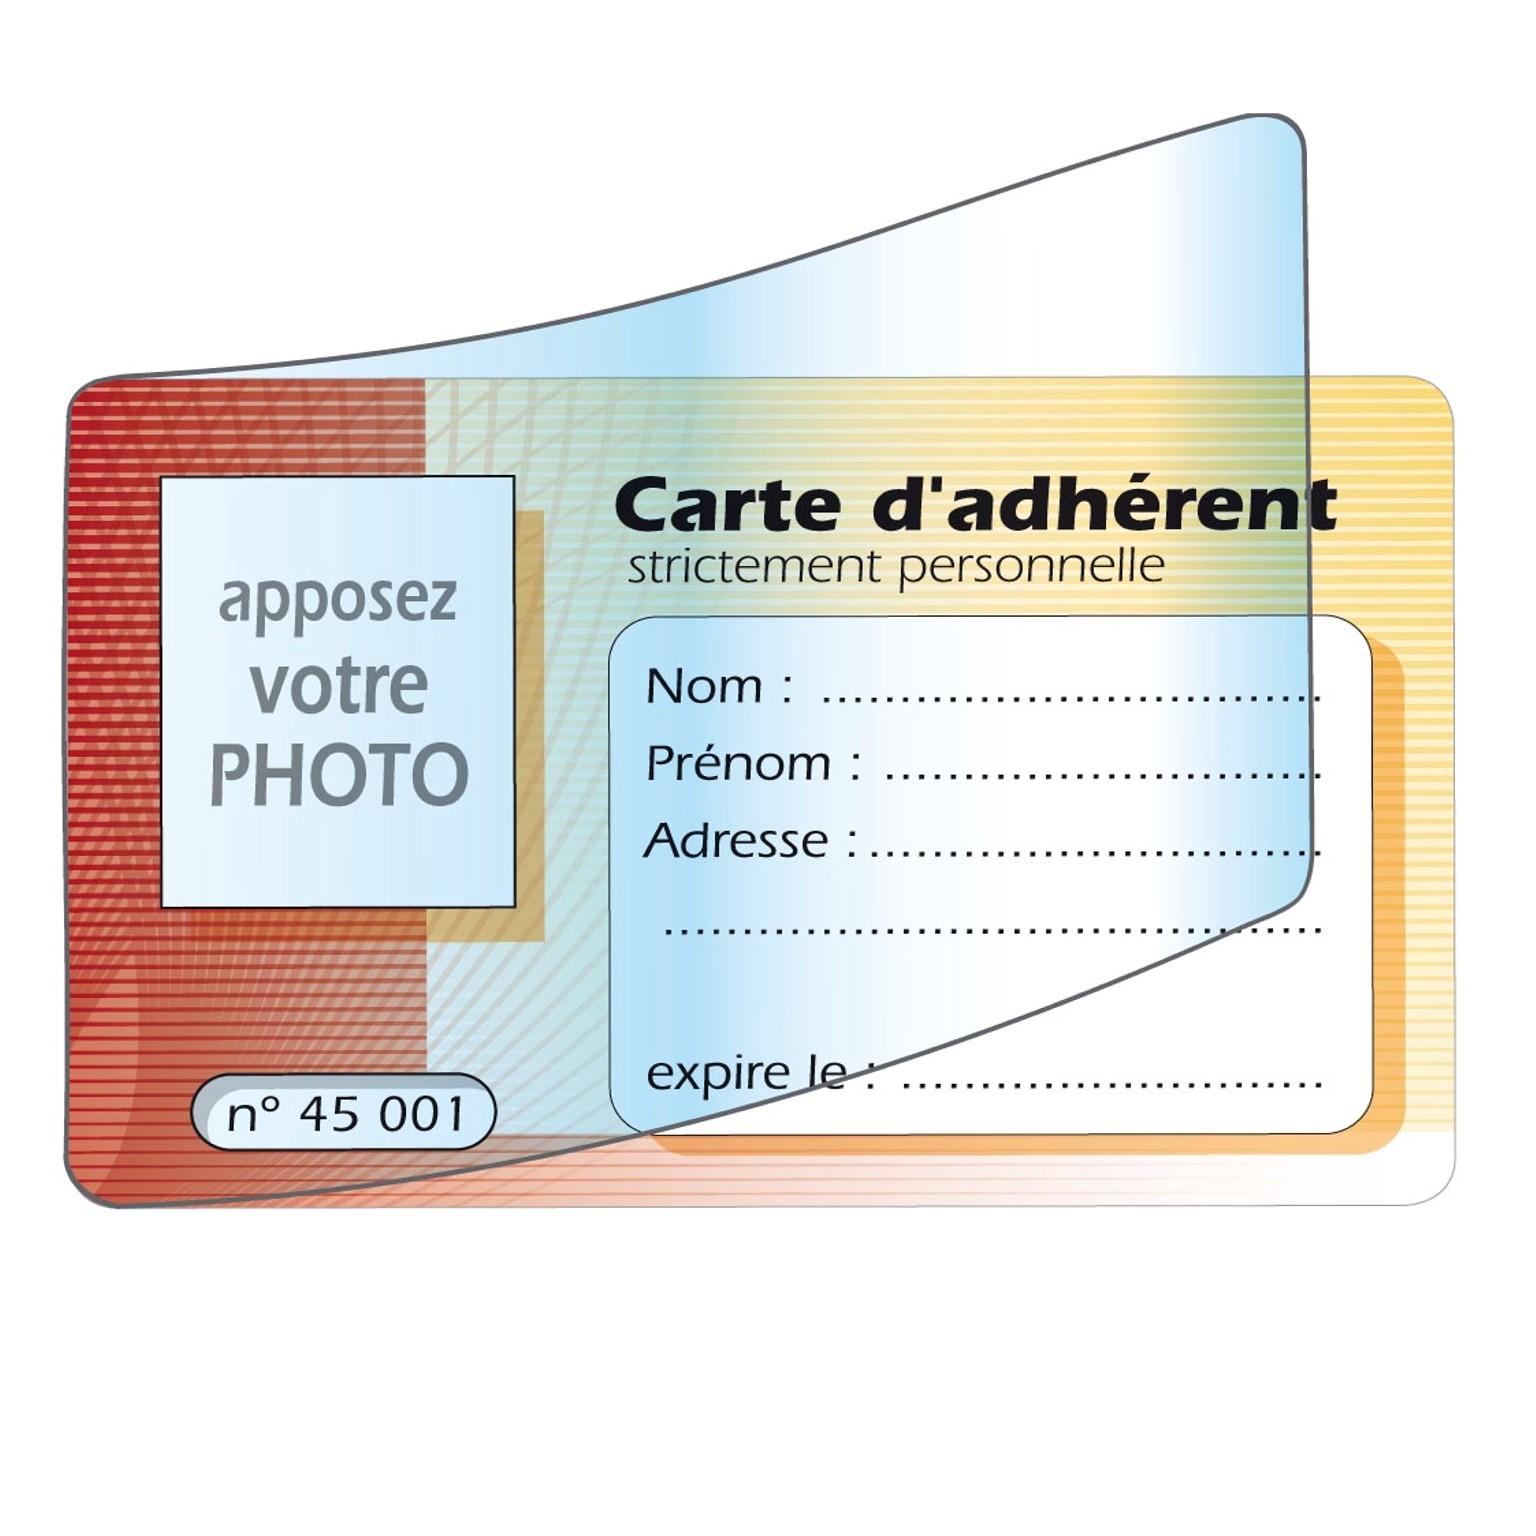 Cartes adhérents Cartea10